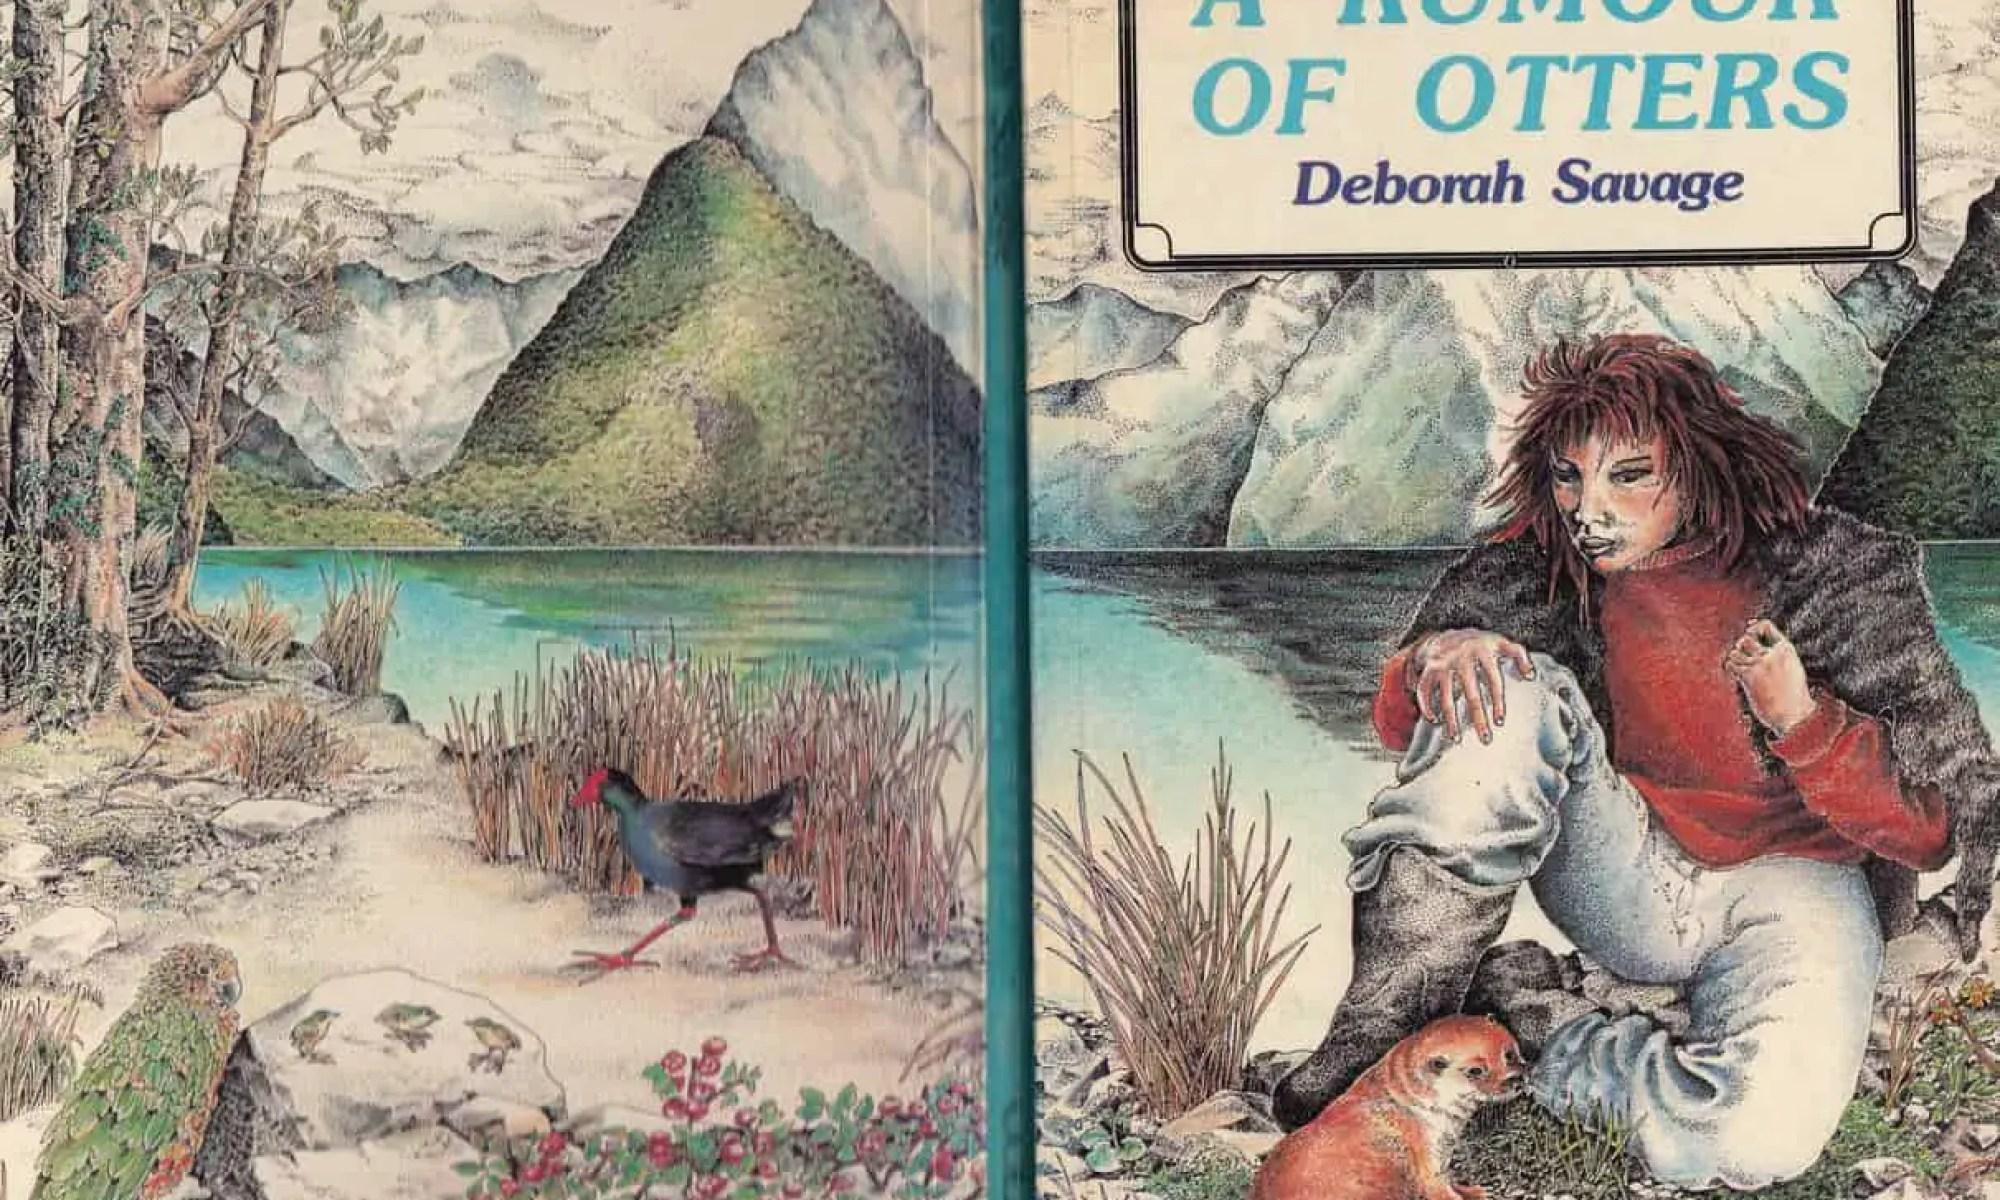 A Rumour Of Otters by Deborah Savage